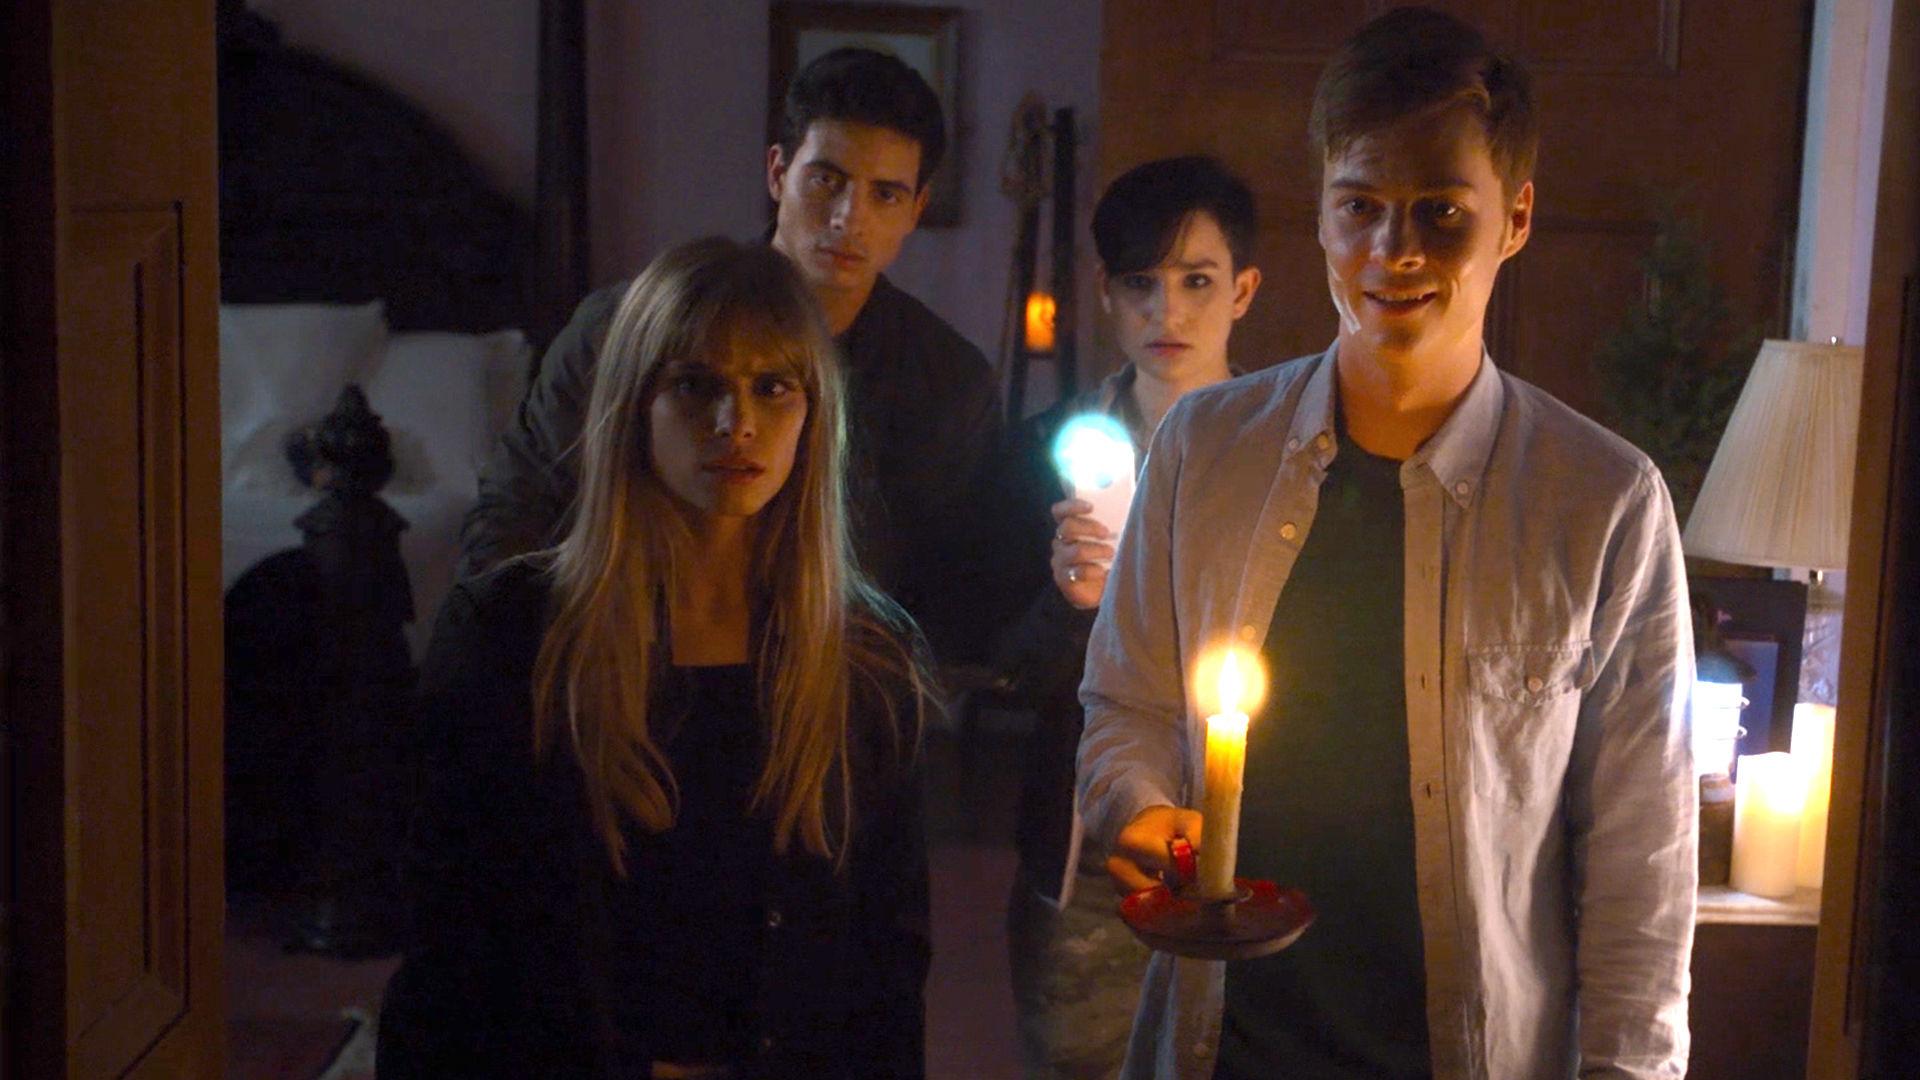 Scream: The TV Series - Halloween Special extra